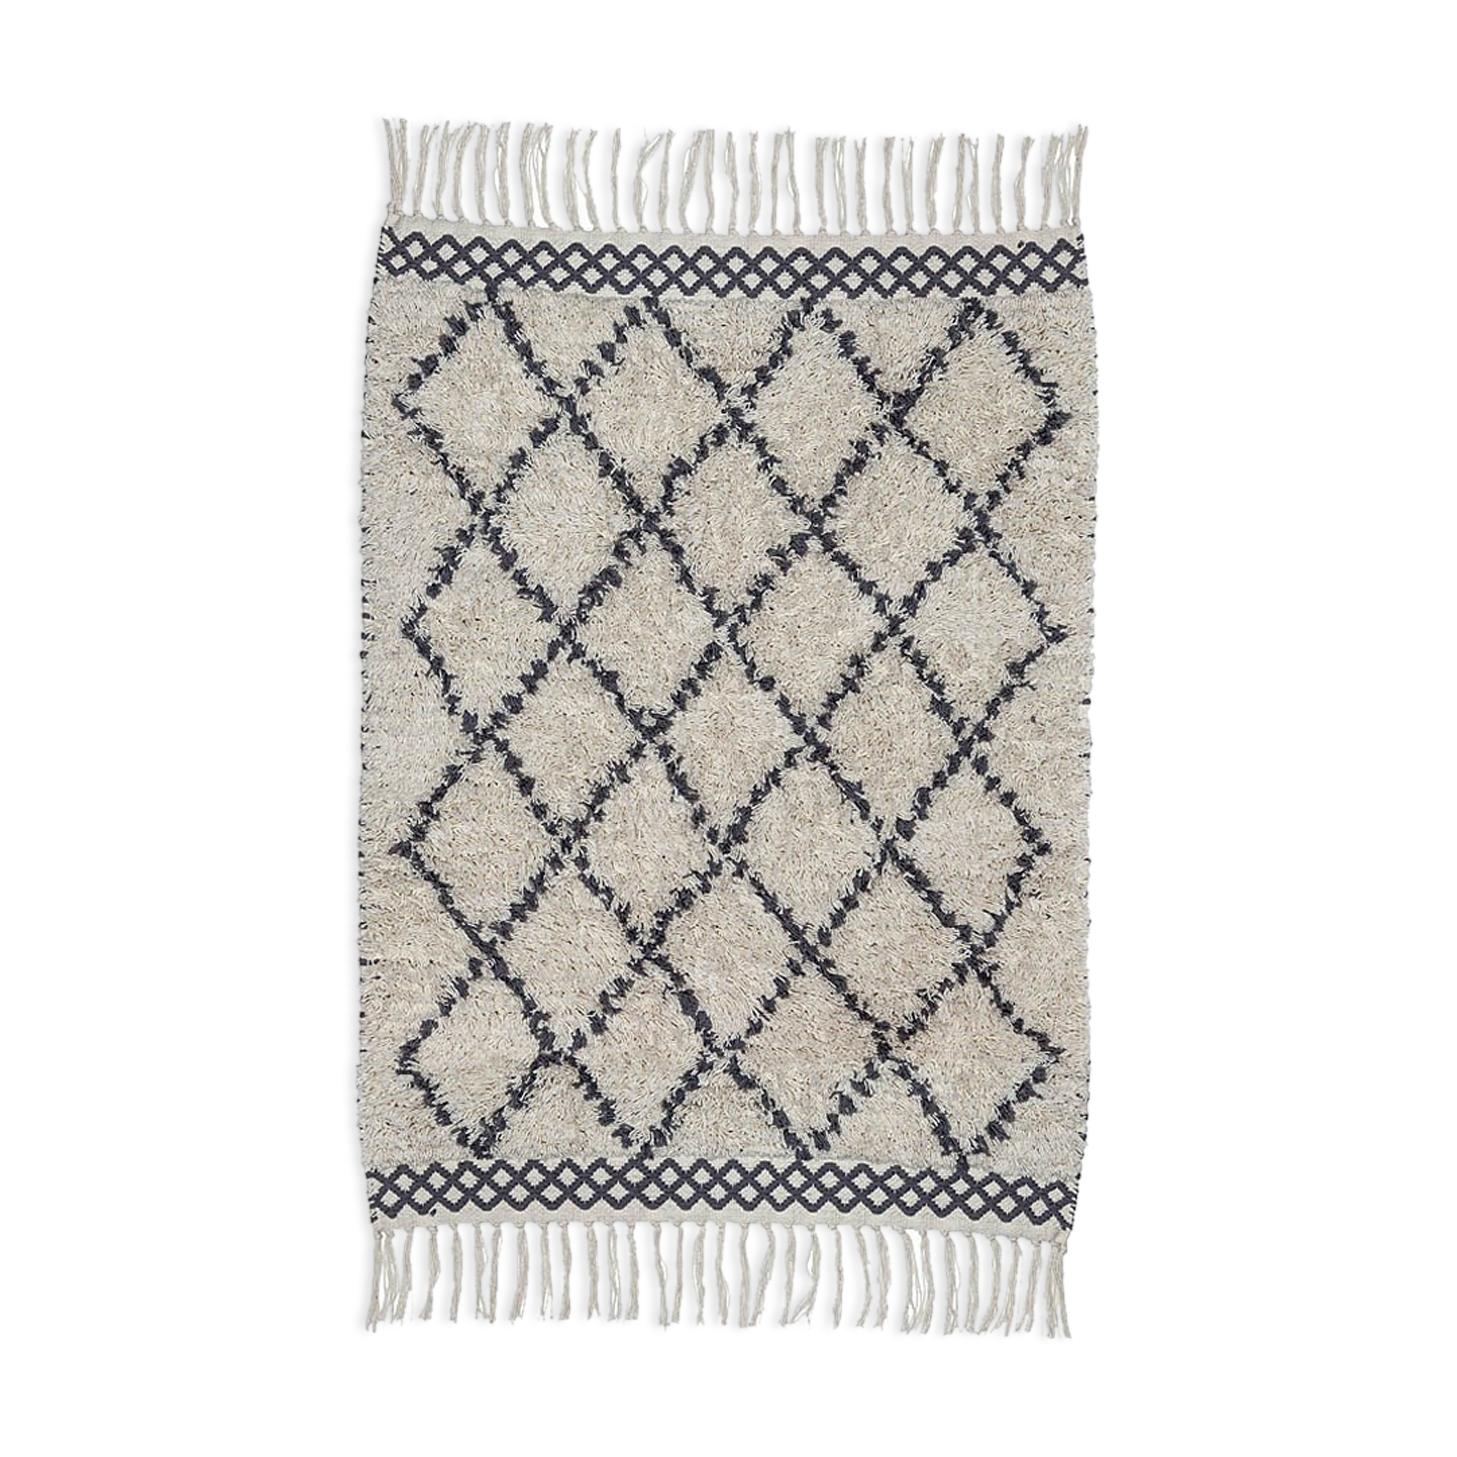 Tapis berbere en coton 70 x 140 cm